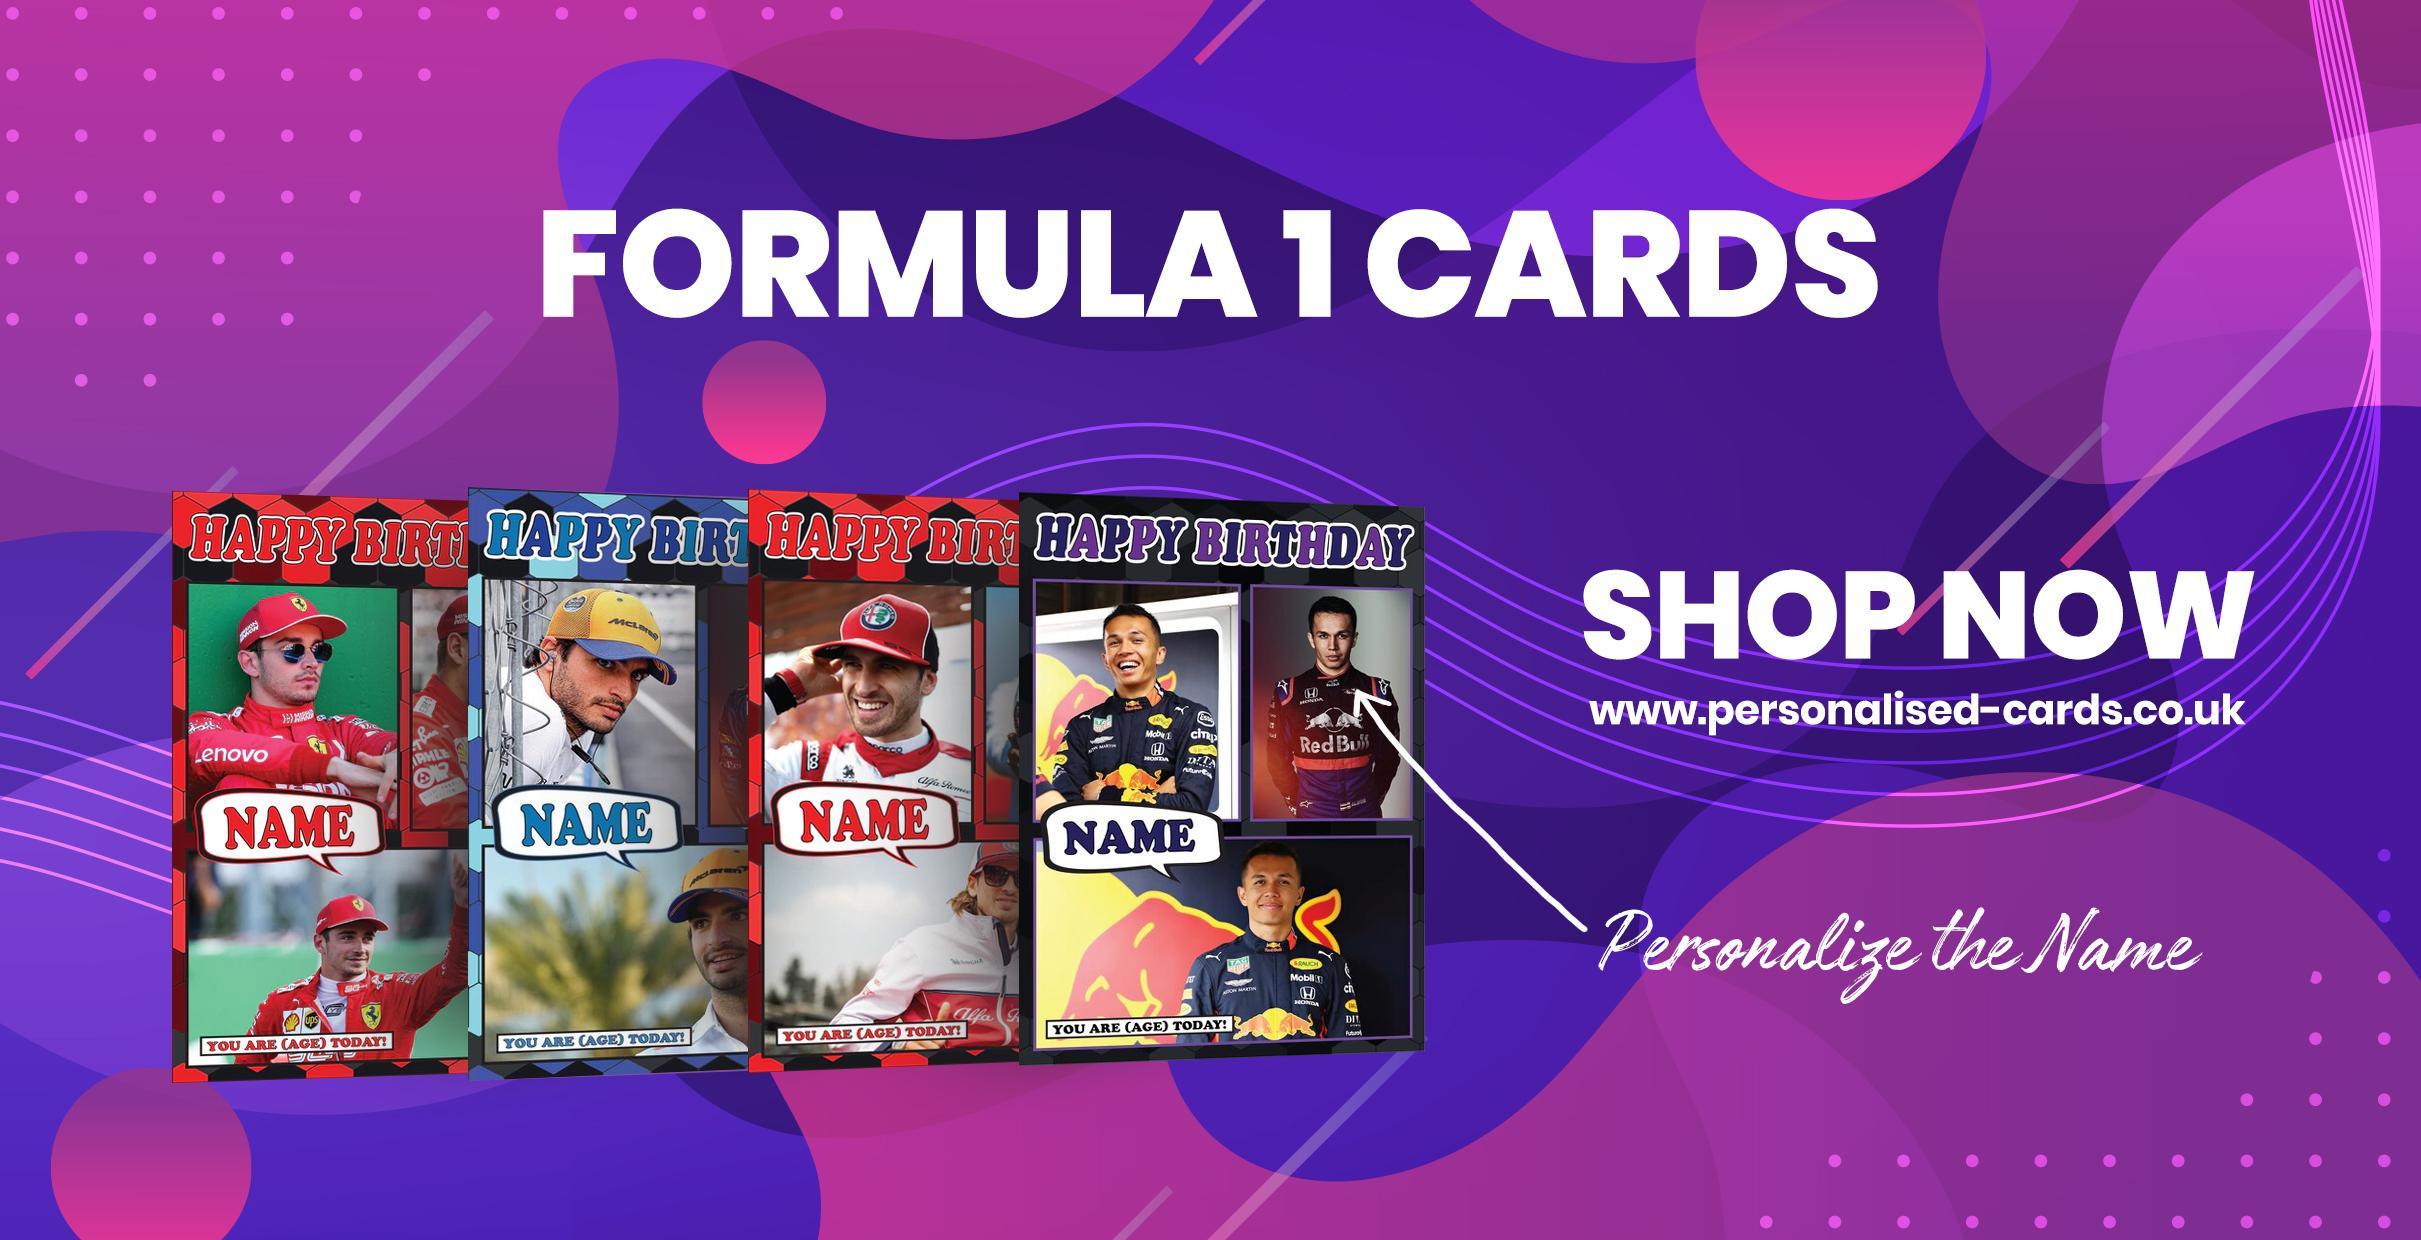 formula-1-cards.jpg